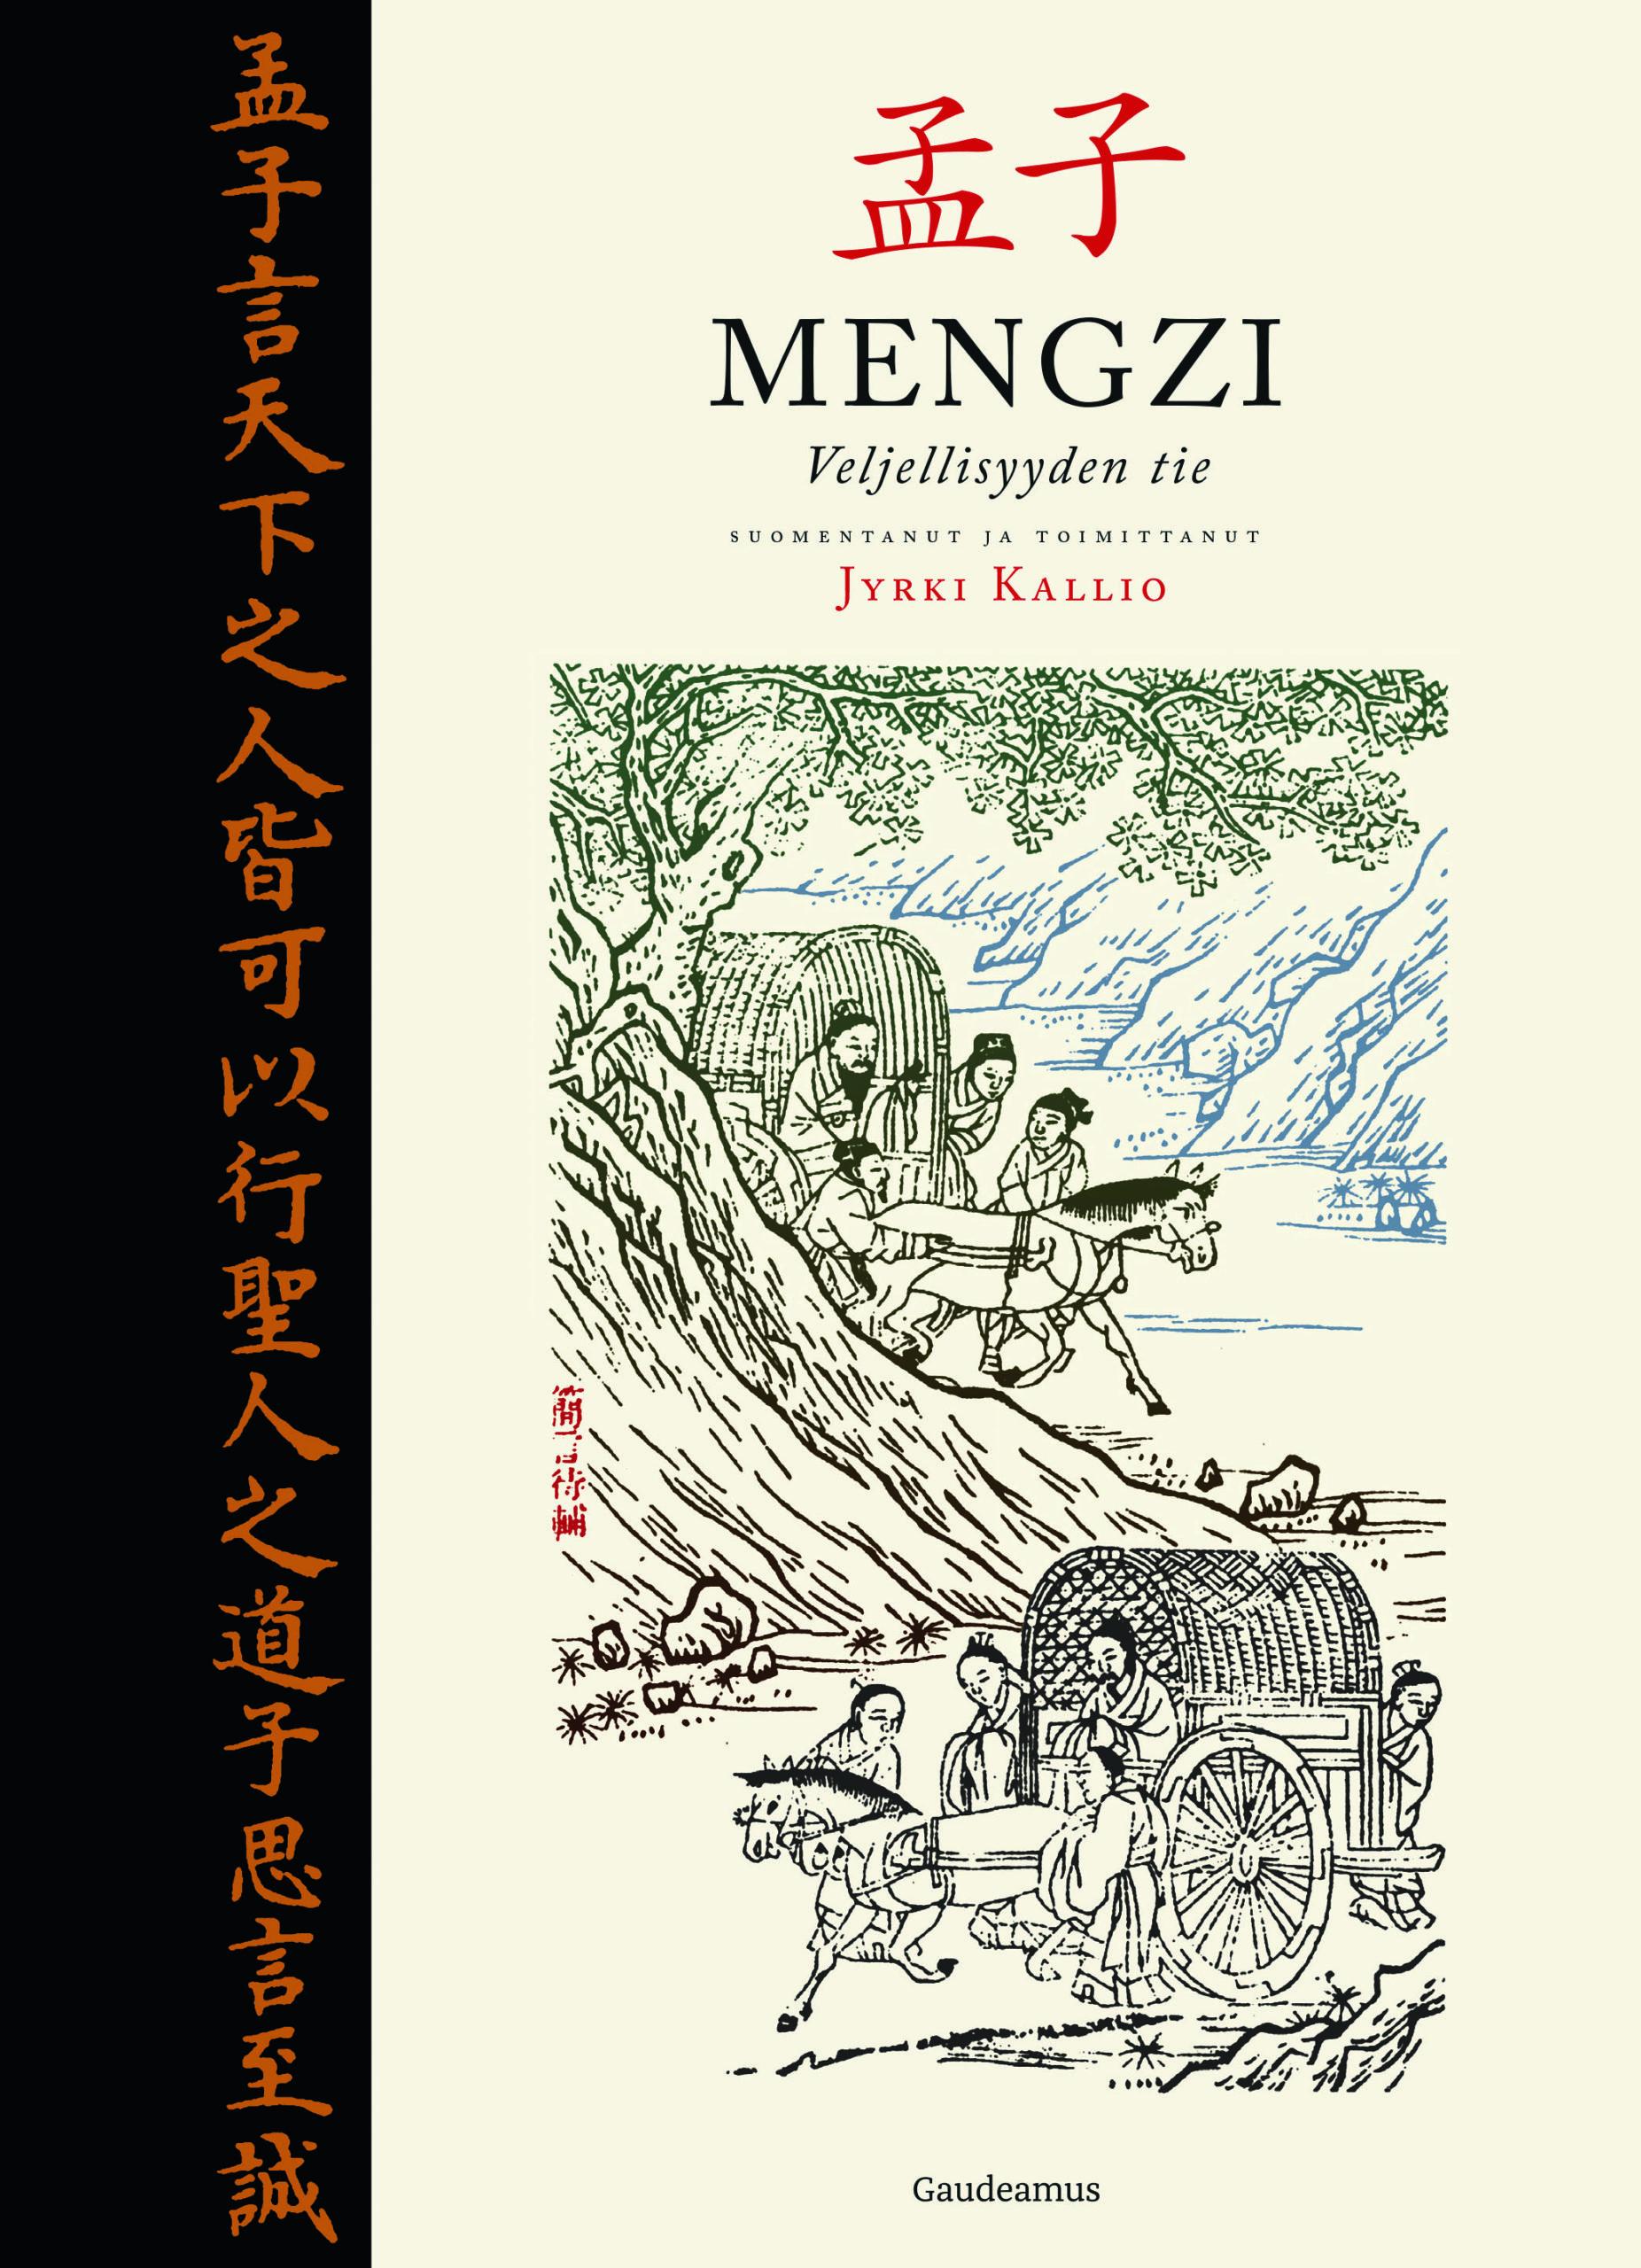 Jyrki Kallio Mengzi – Veljellisyyden tie